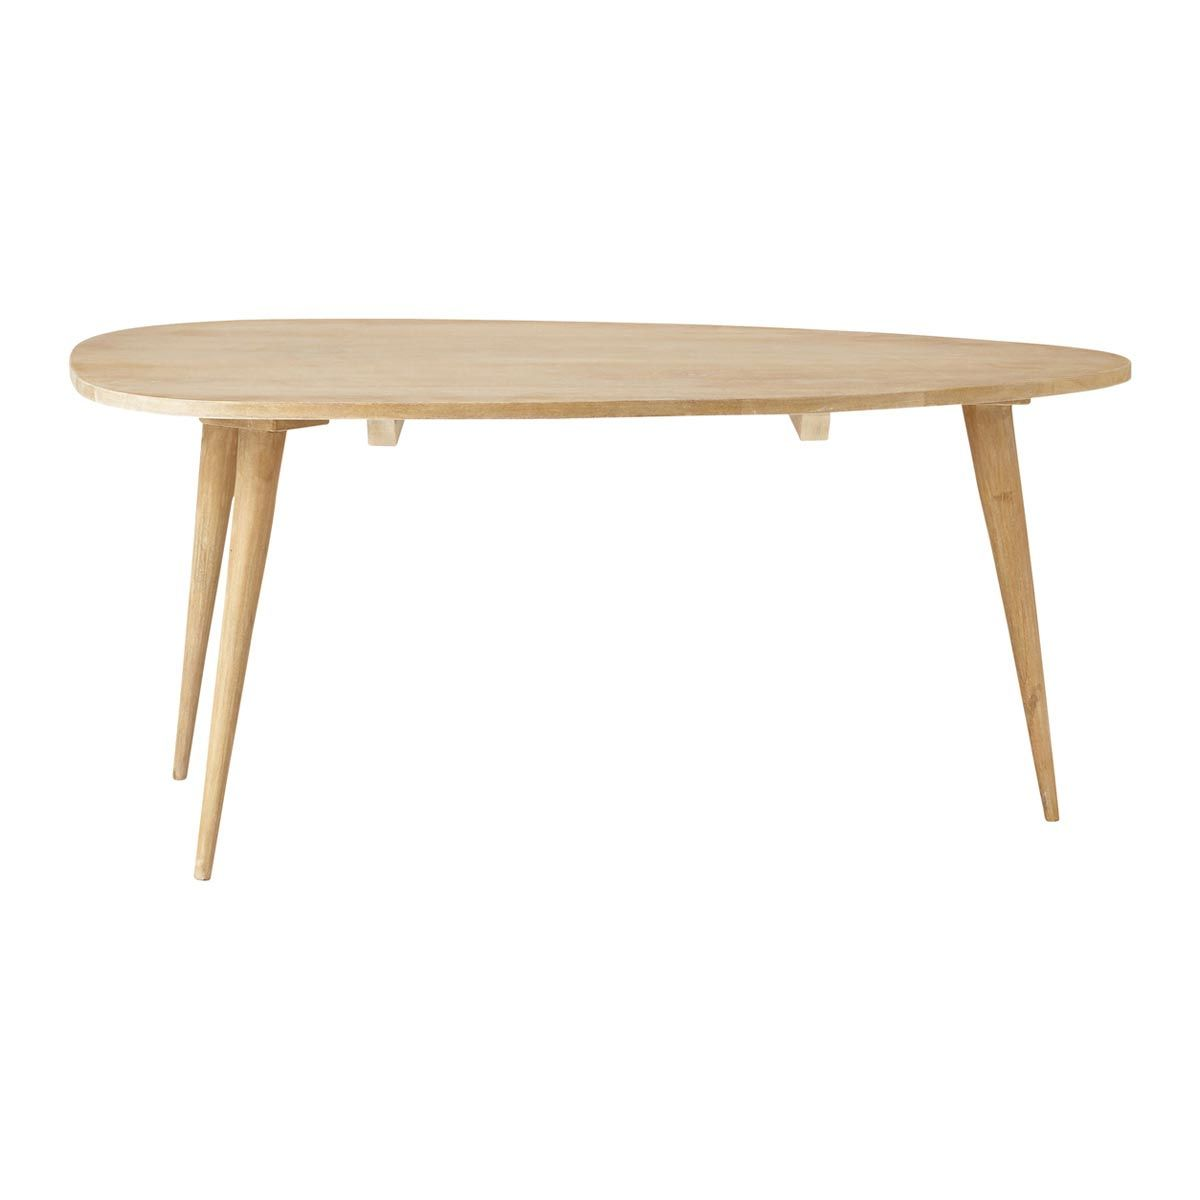 Solid mango wood vintage coffee table W 100cm Trocadero